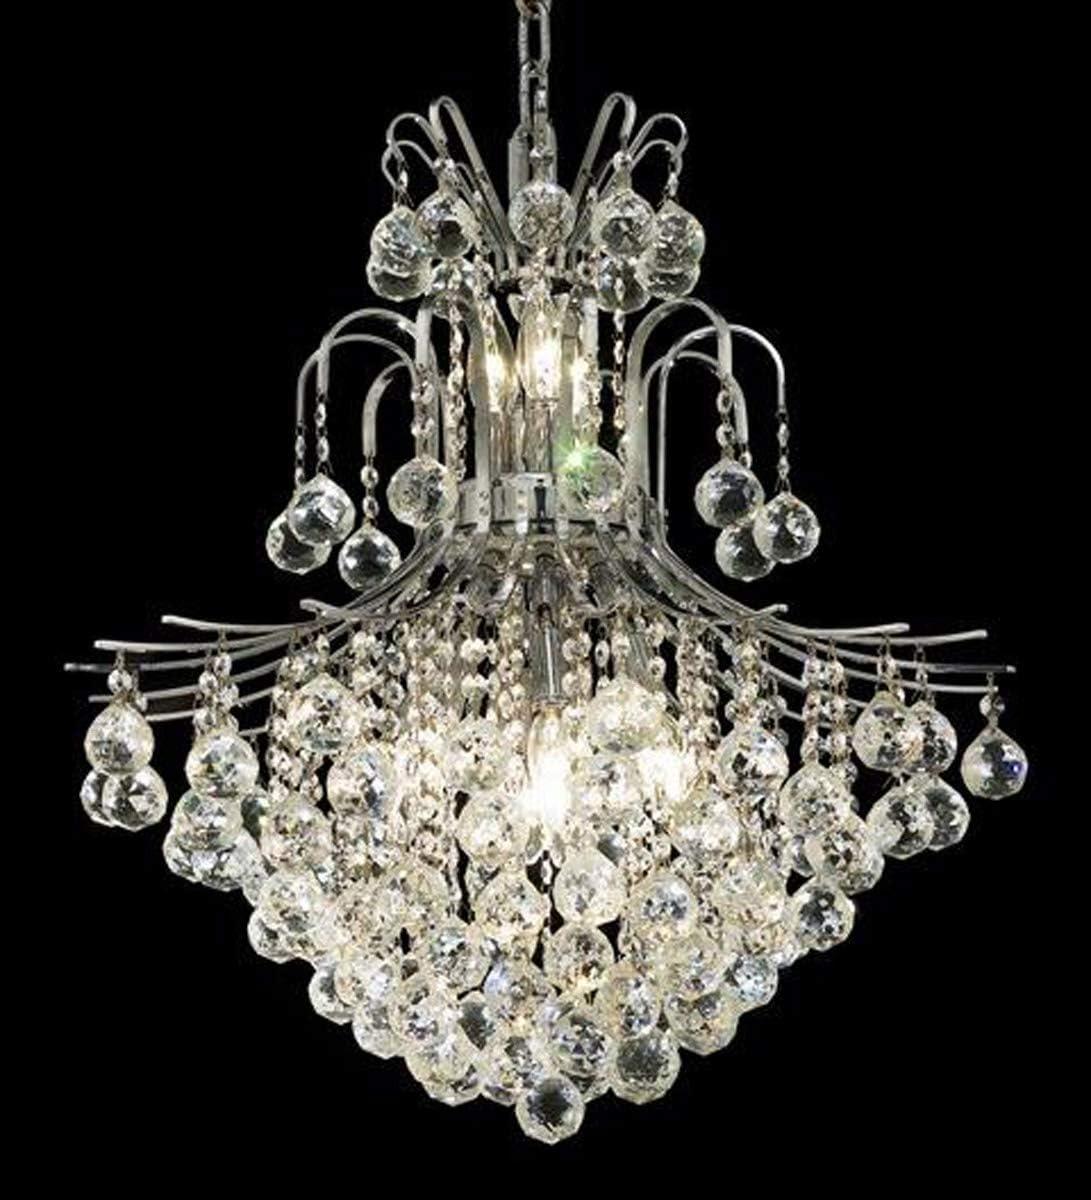 Elegant Lighting 8002D22C EC Toureg Collection 11-Light Hanging Fixture with Elegant Cut Crystals, Chrome Finish